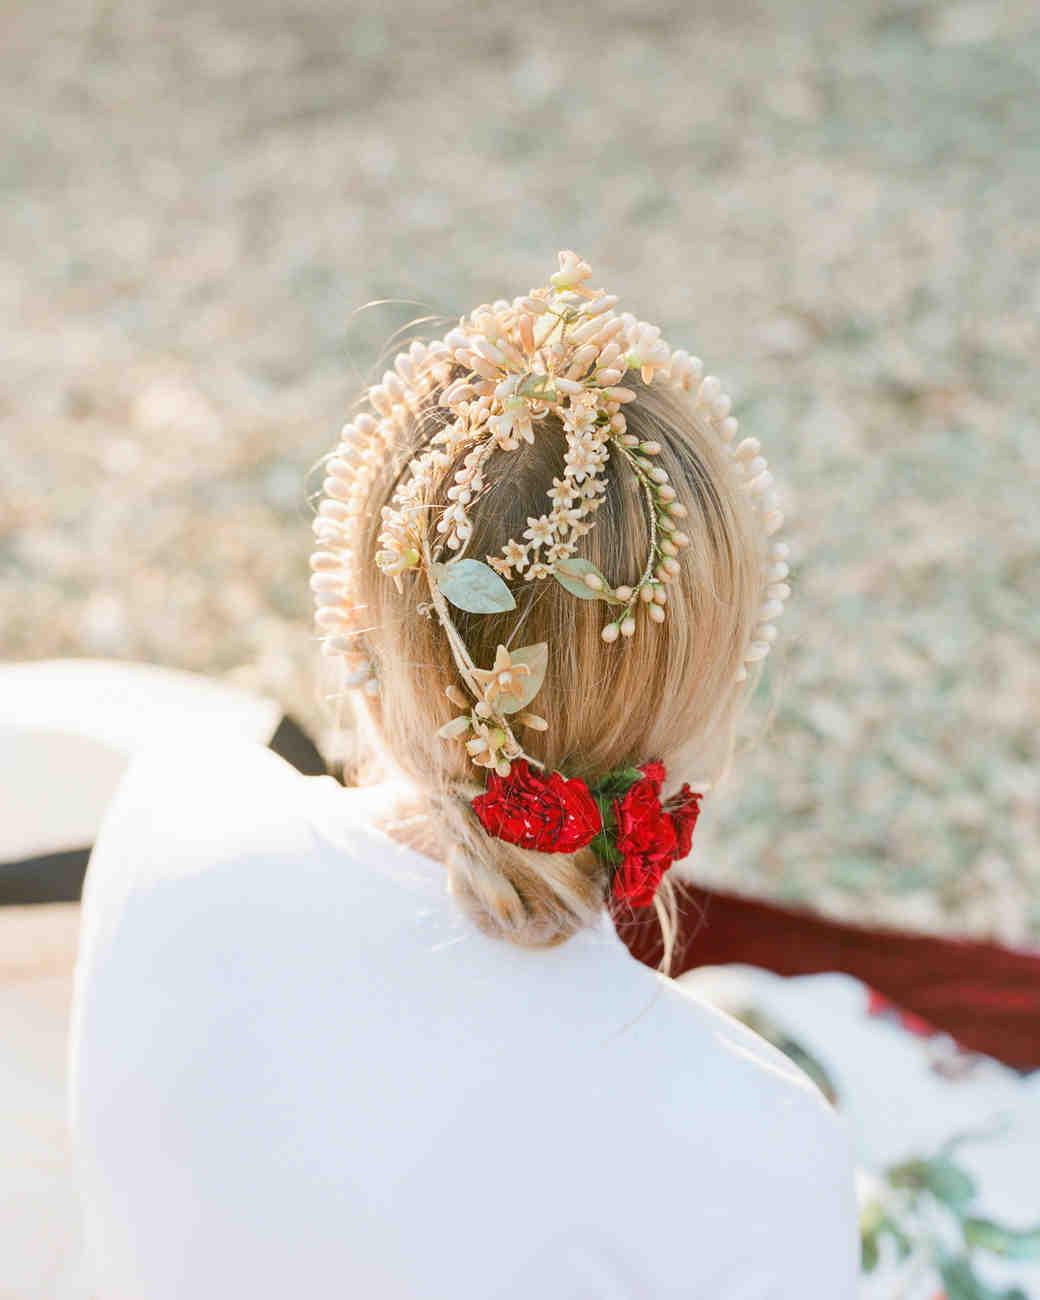 petra-marc-wedding-santa-barbara-0972-s111812-0815.jpg